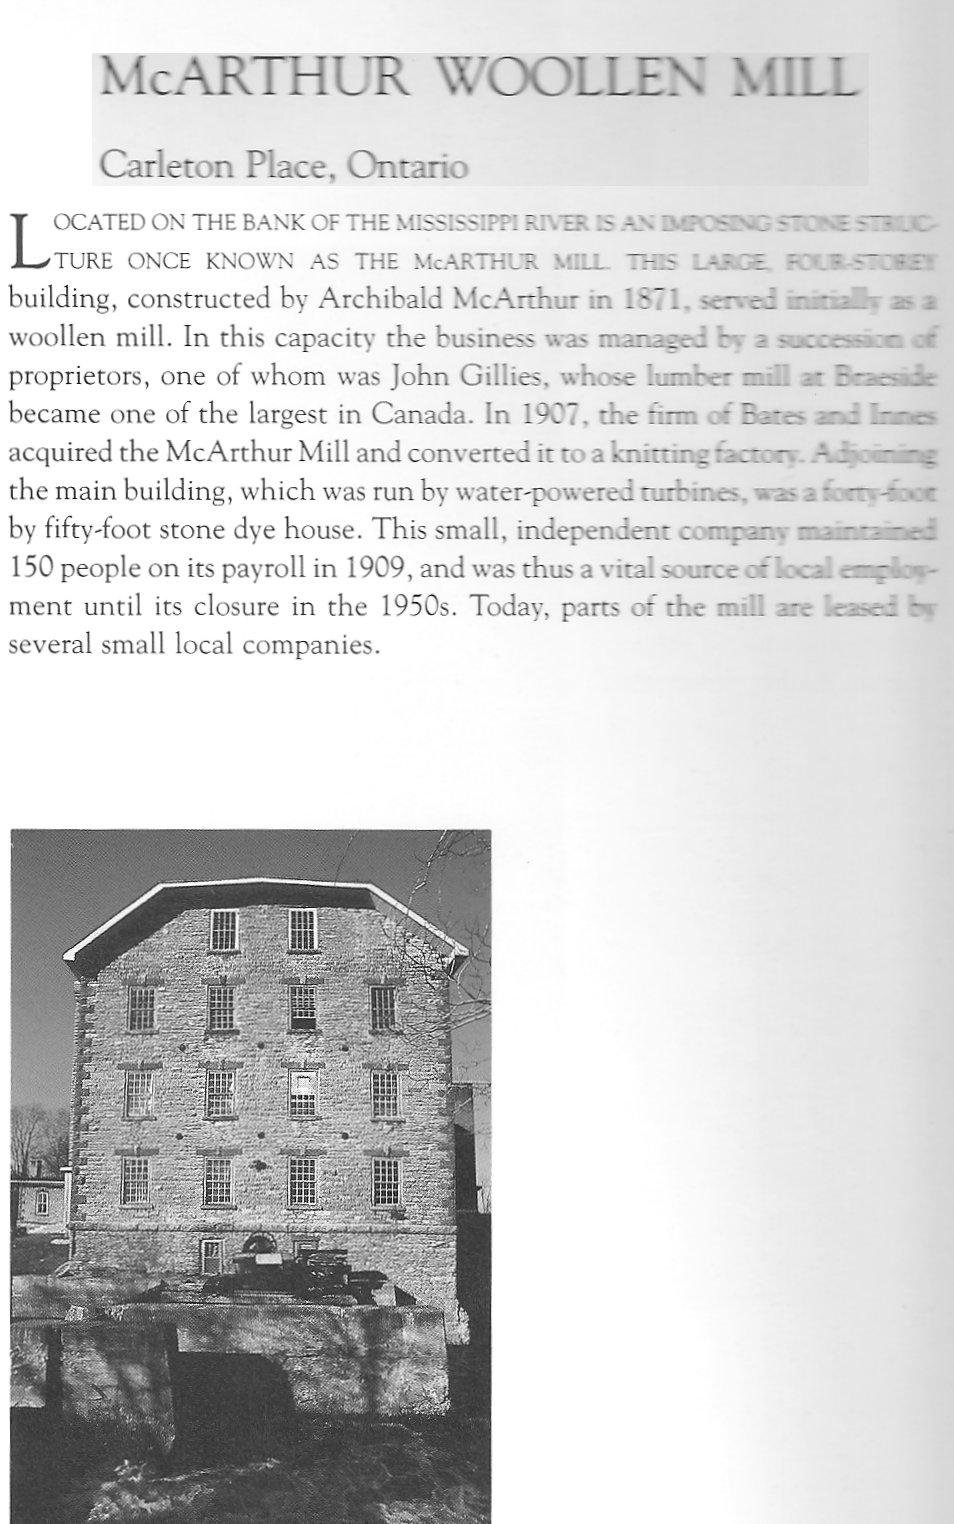 Archibald McArthur Woolen Mill in Carelton Place, Ontario, Canada